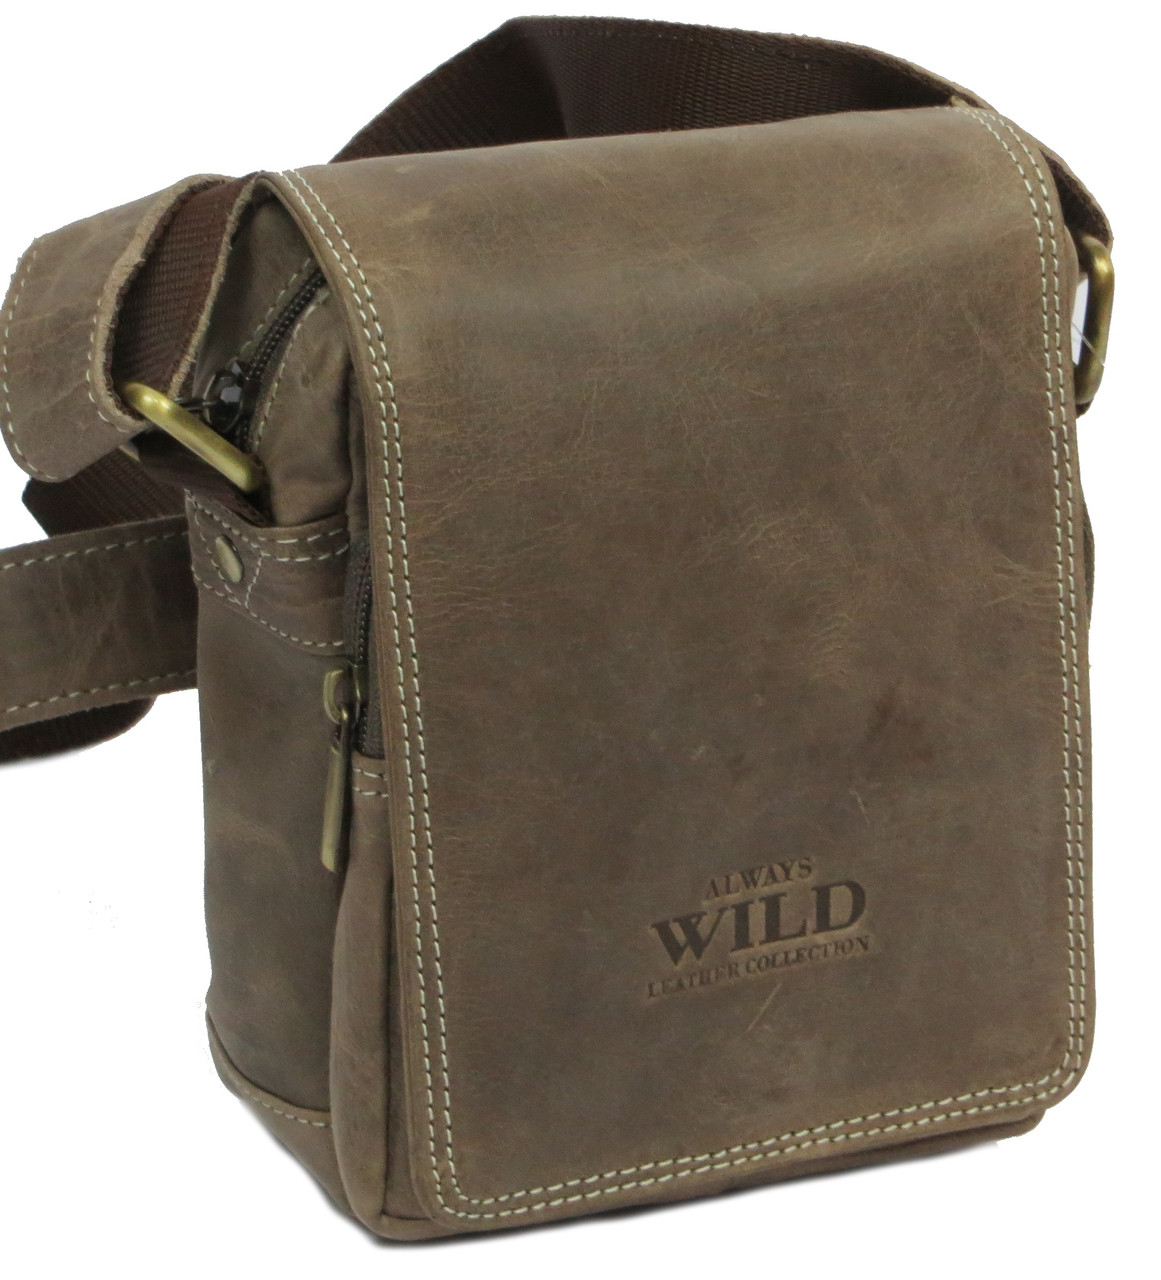 Кожаная сумка Always Wild 250591 серый